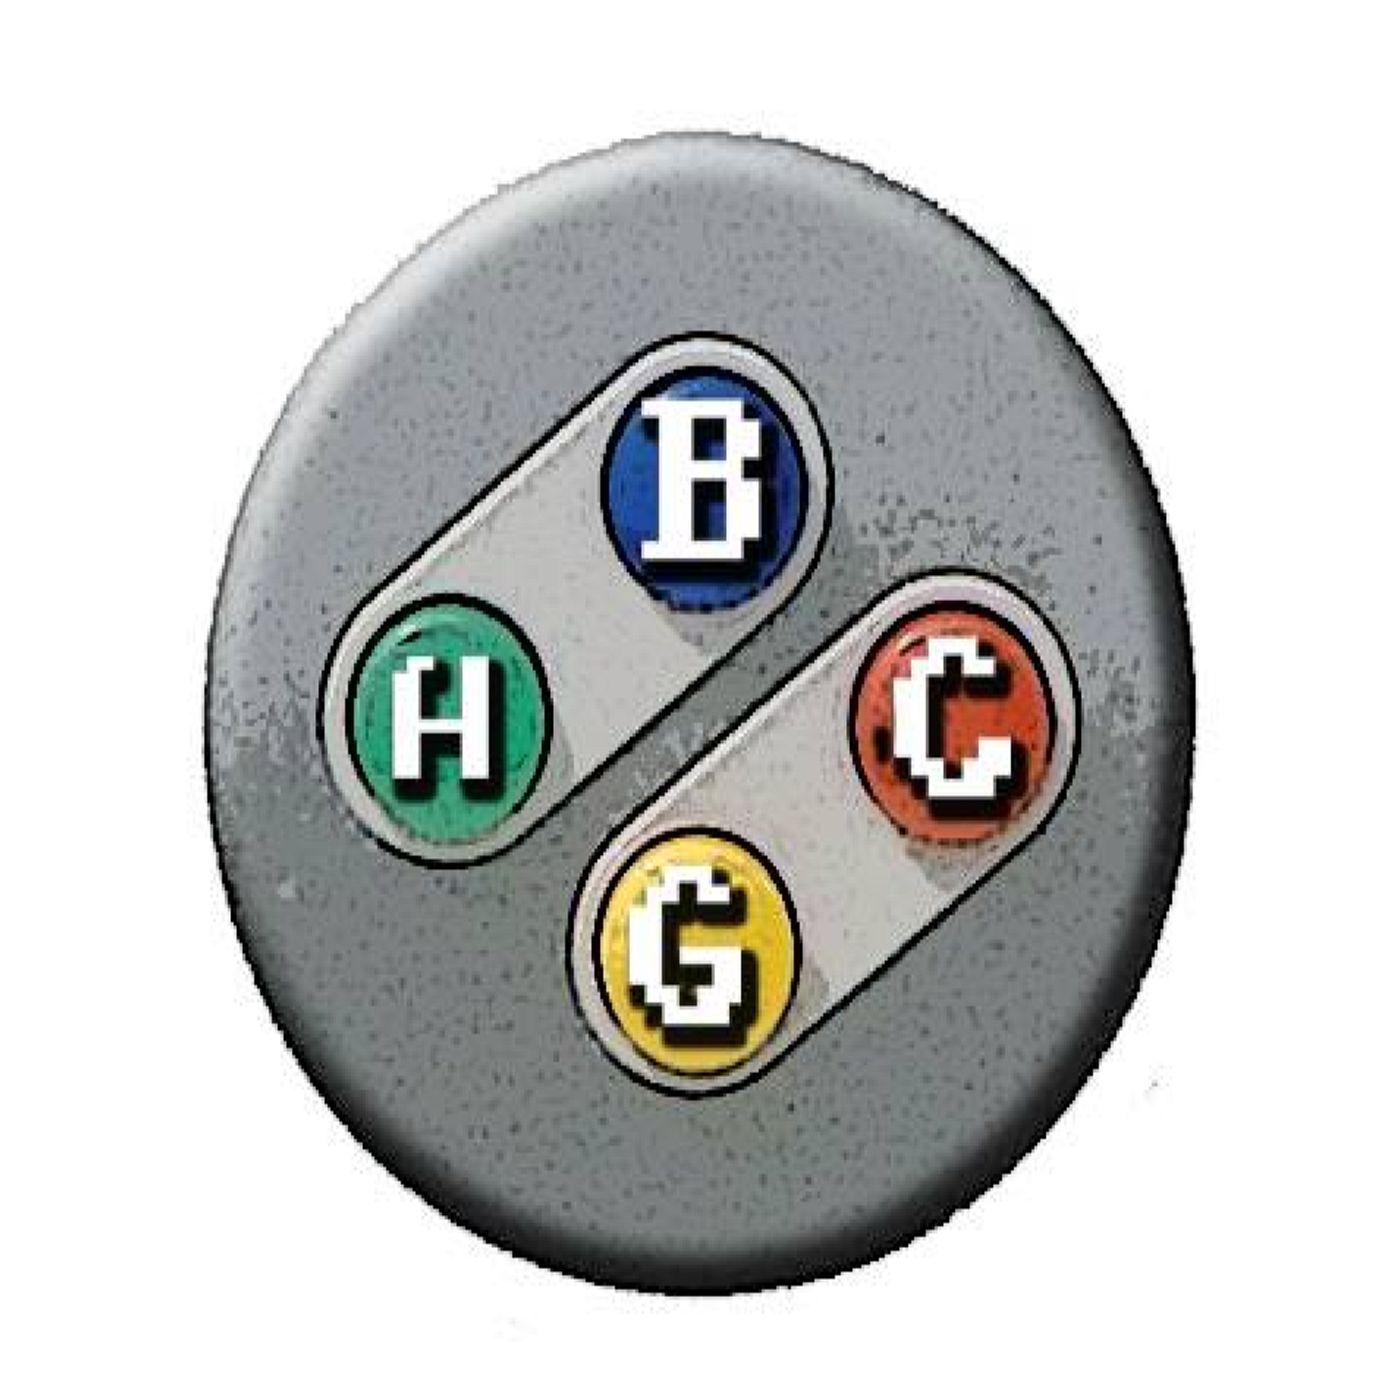 Hyper-Bolic Game Chamber